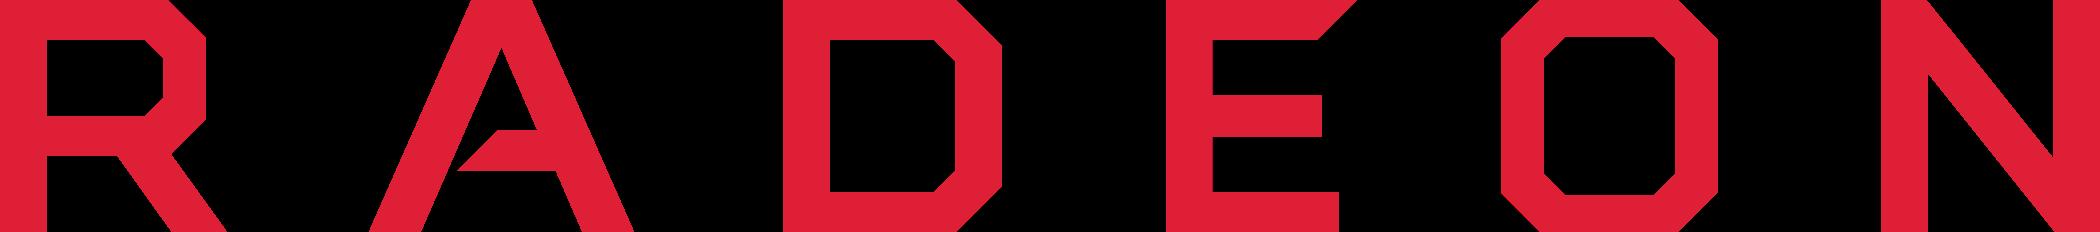 radeon-logo-2